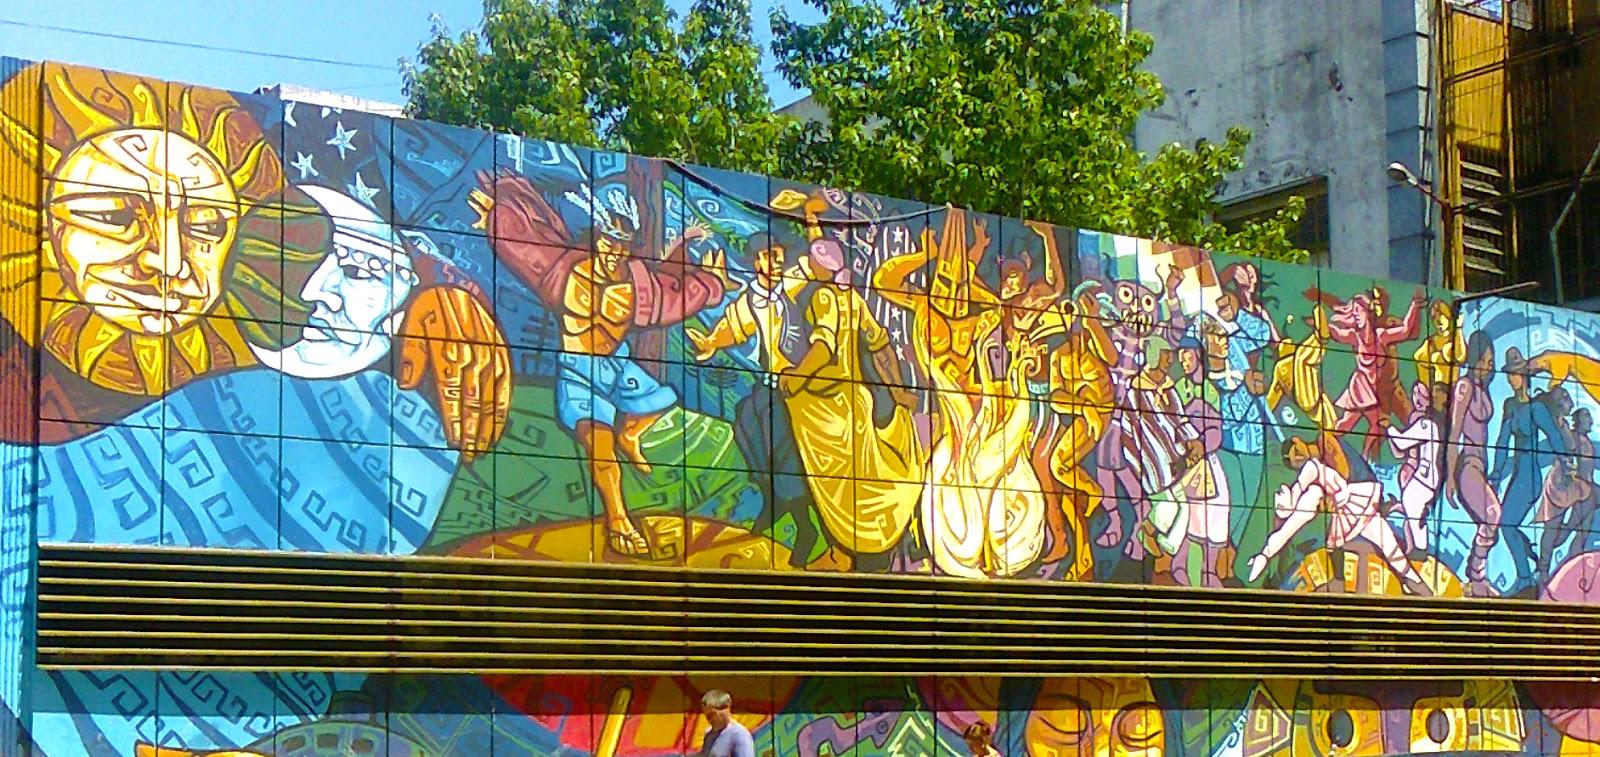 Murales en paredes exteriores materiales de construcci n for Materiales para pintar un mural